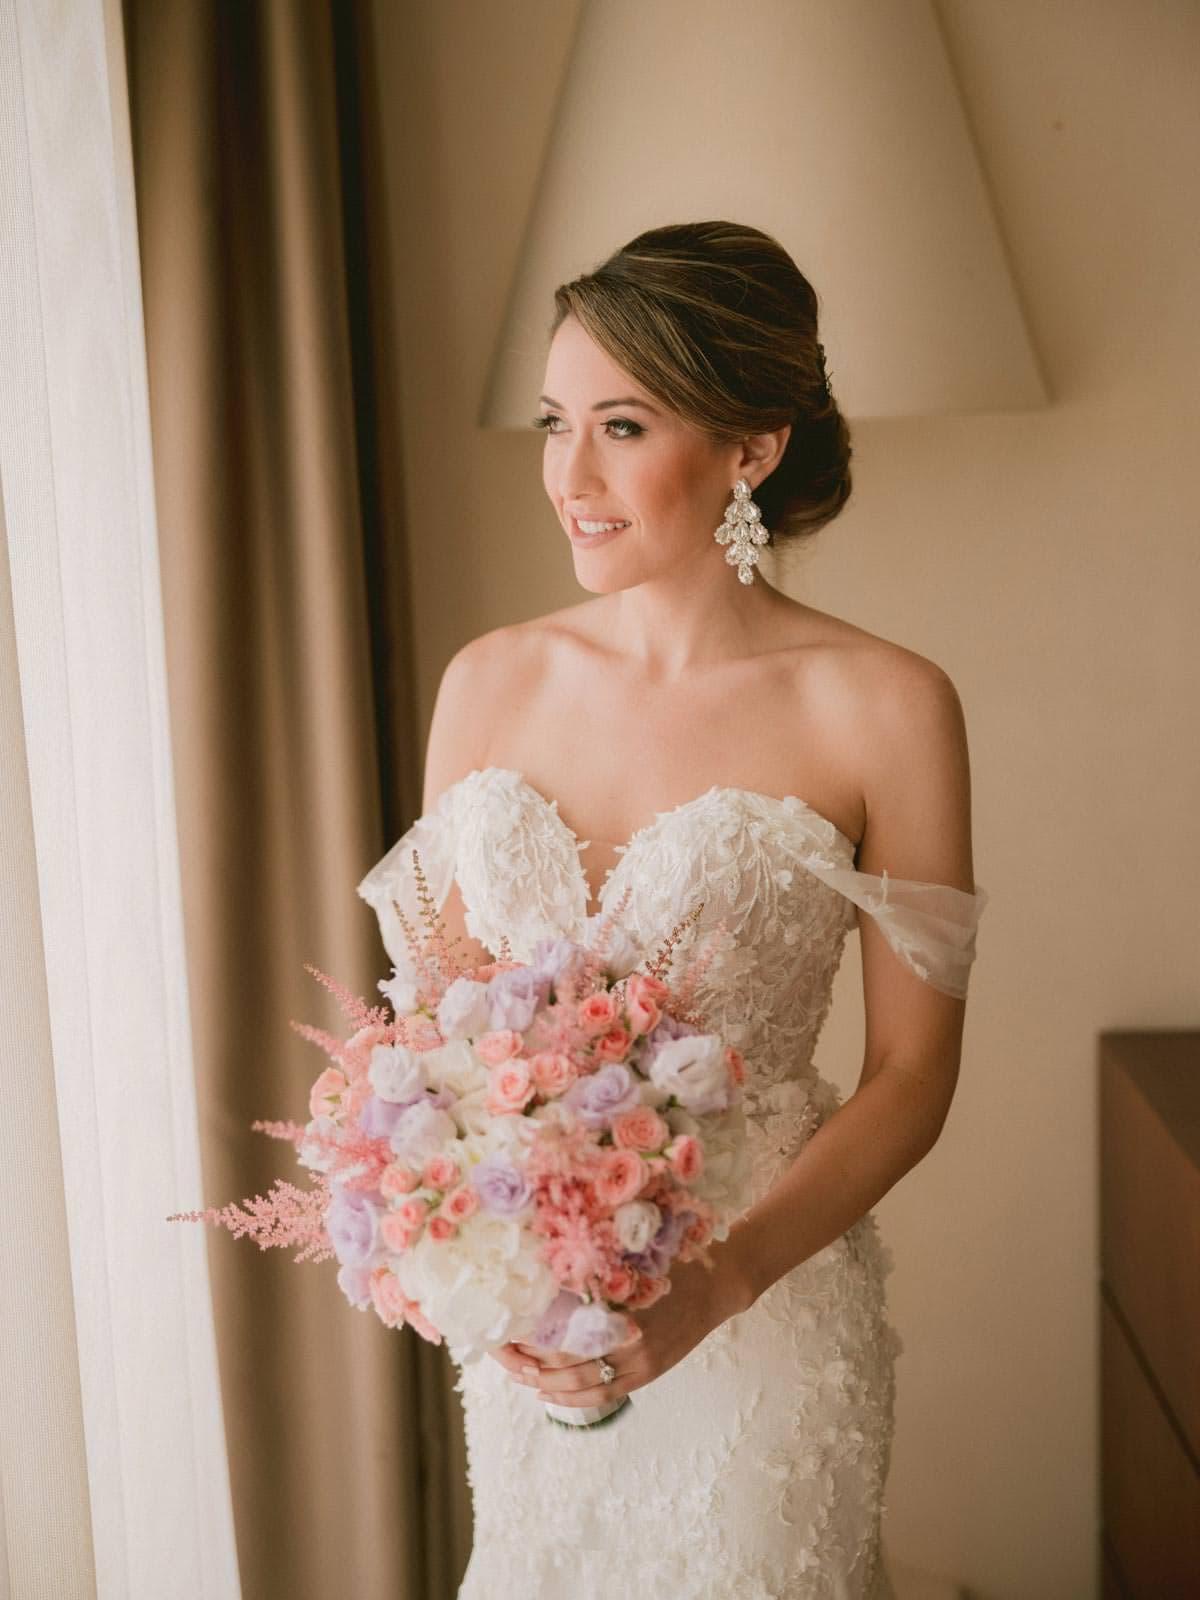 the beautiful Hadeel in her wedding gown